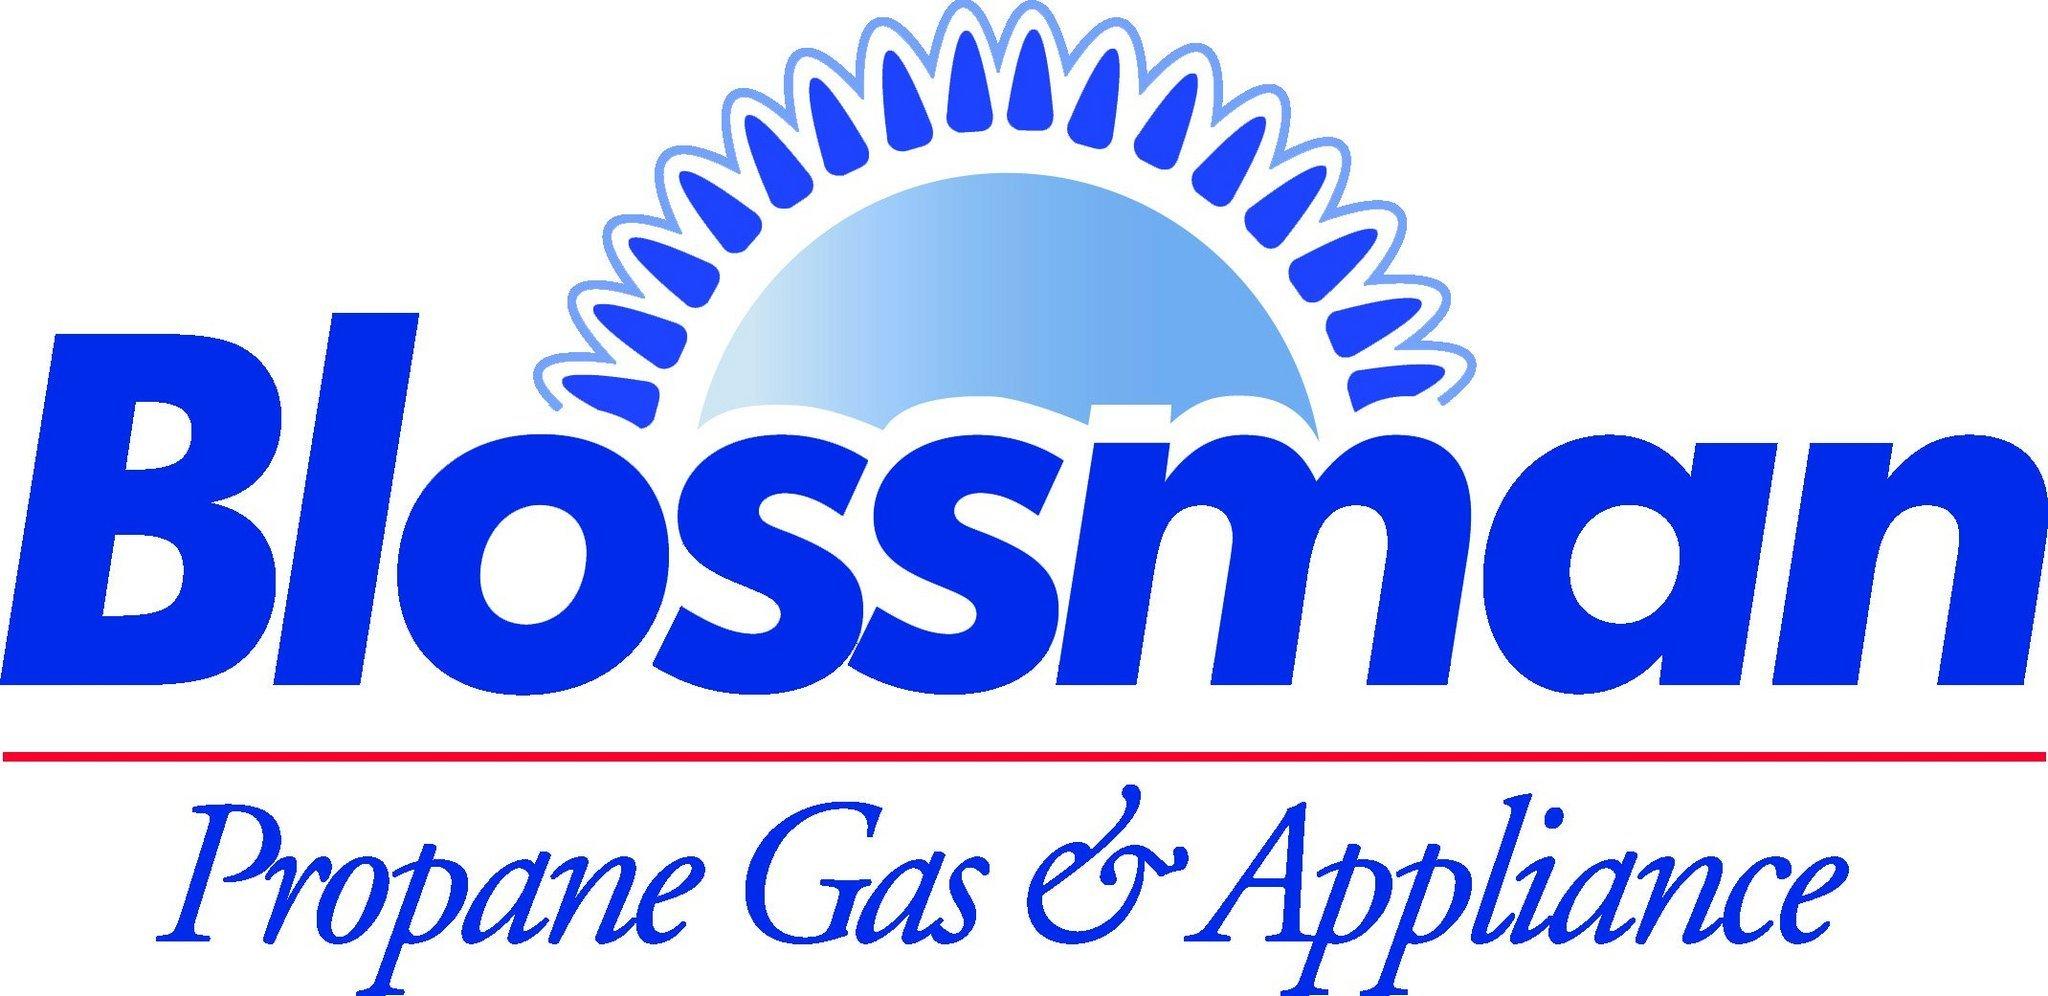 blossman gas logo.jpg